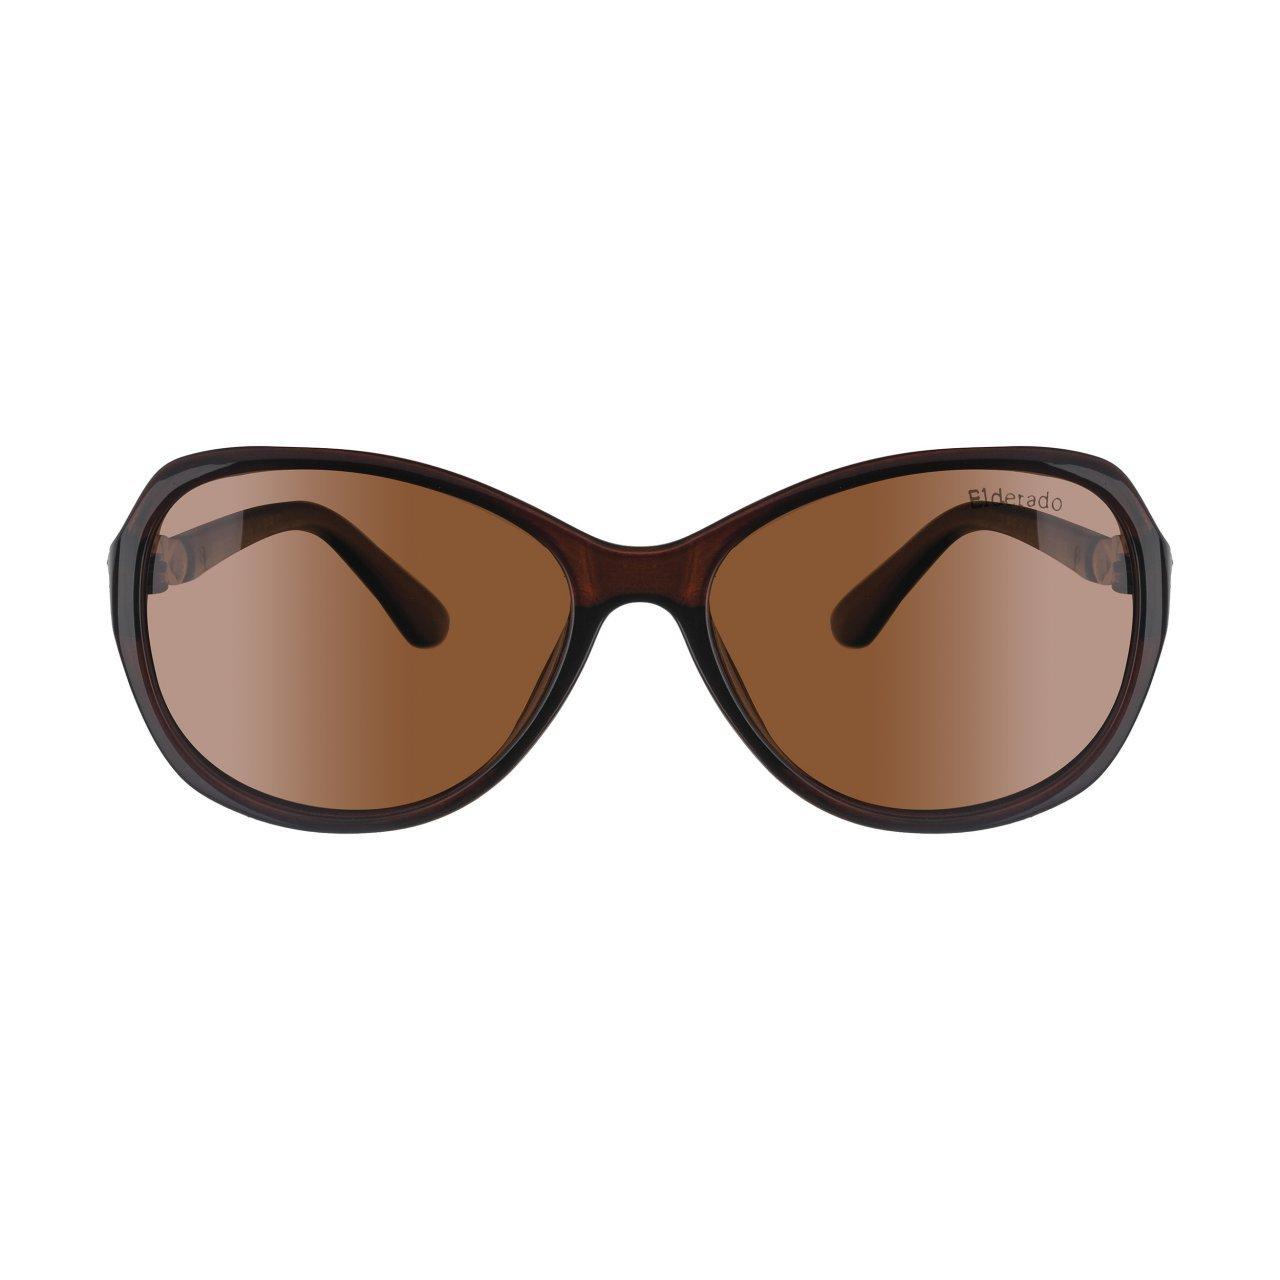 عینک آفتابی زنانه الدرادو کد 46